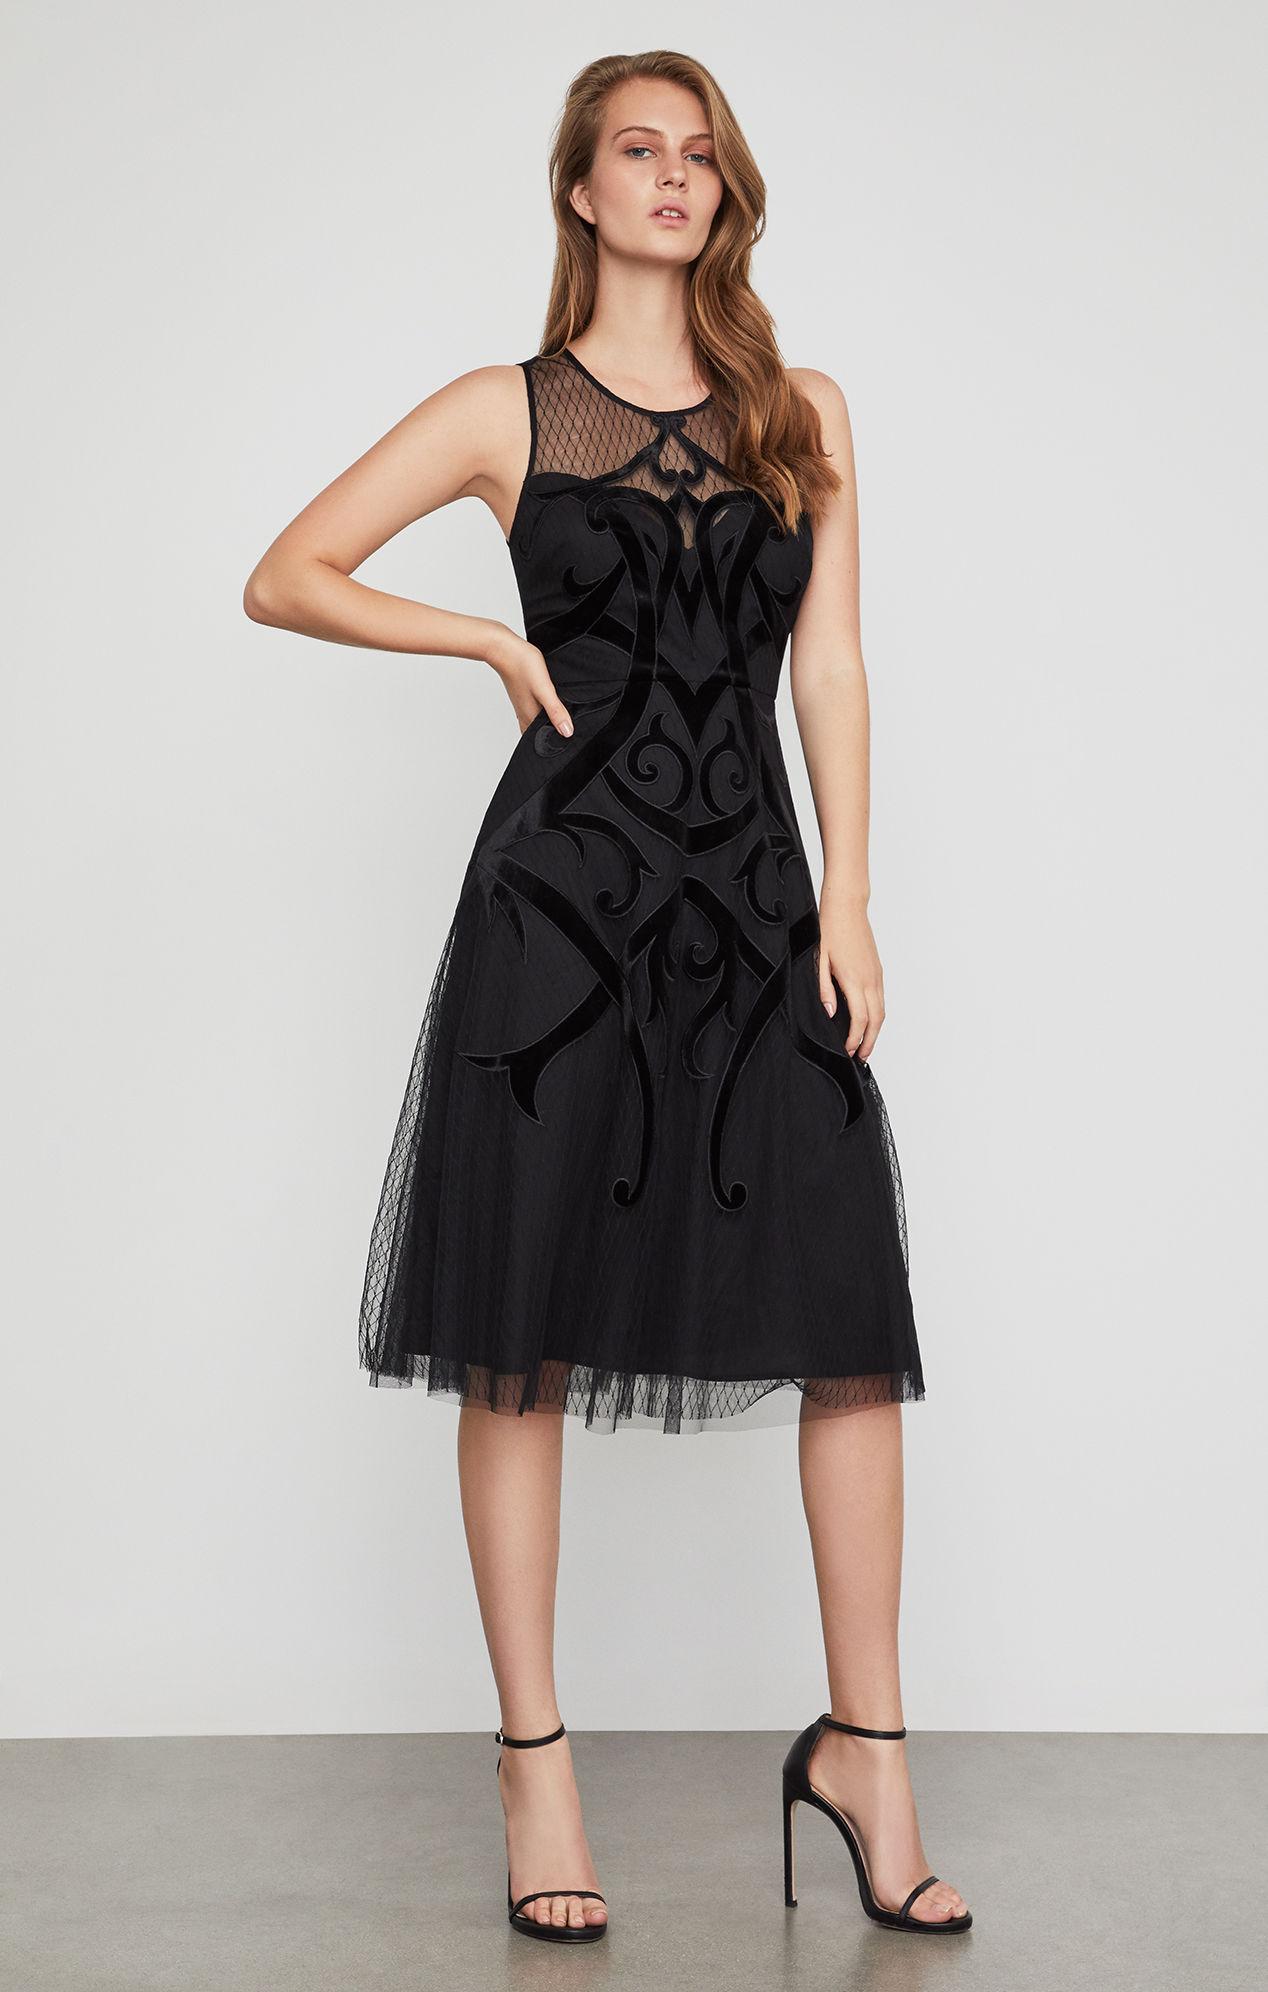 BCBG MAXAZRIA(ビーシービージーマックスアズリア) ミディアムドレス